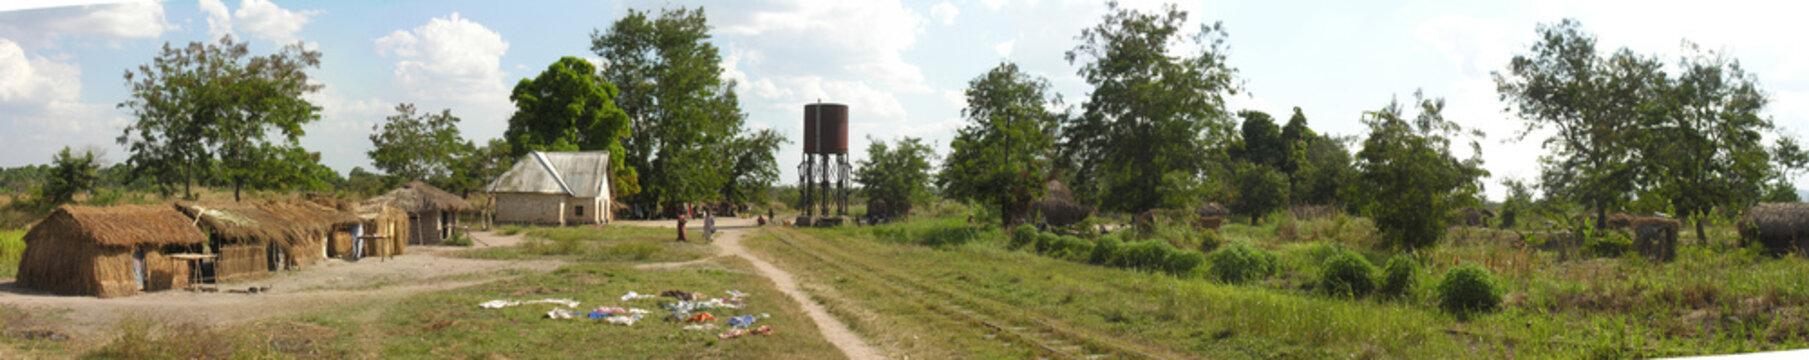 Lwizi, Katanga, Democratic Republic of the Congo: Abandoned railtracks cross rural village